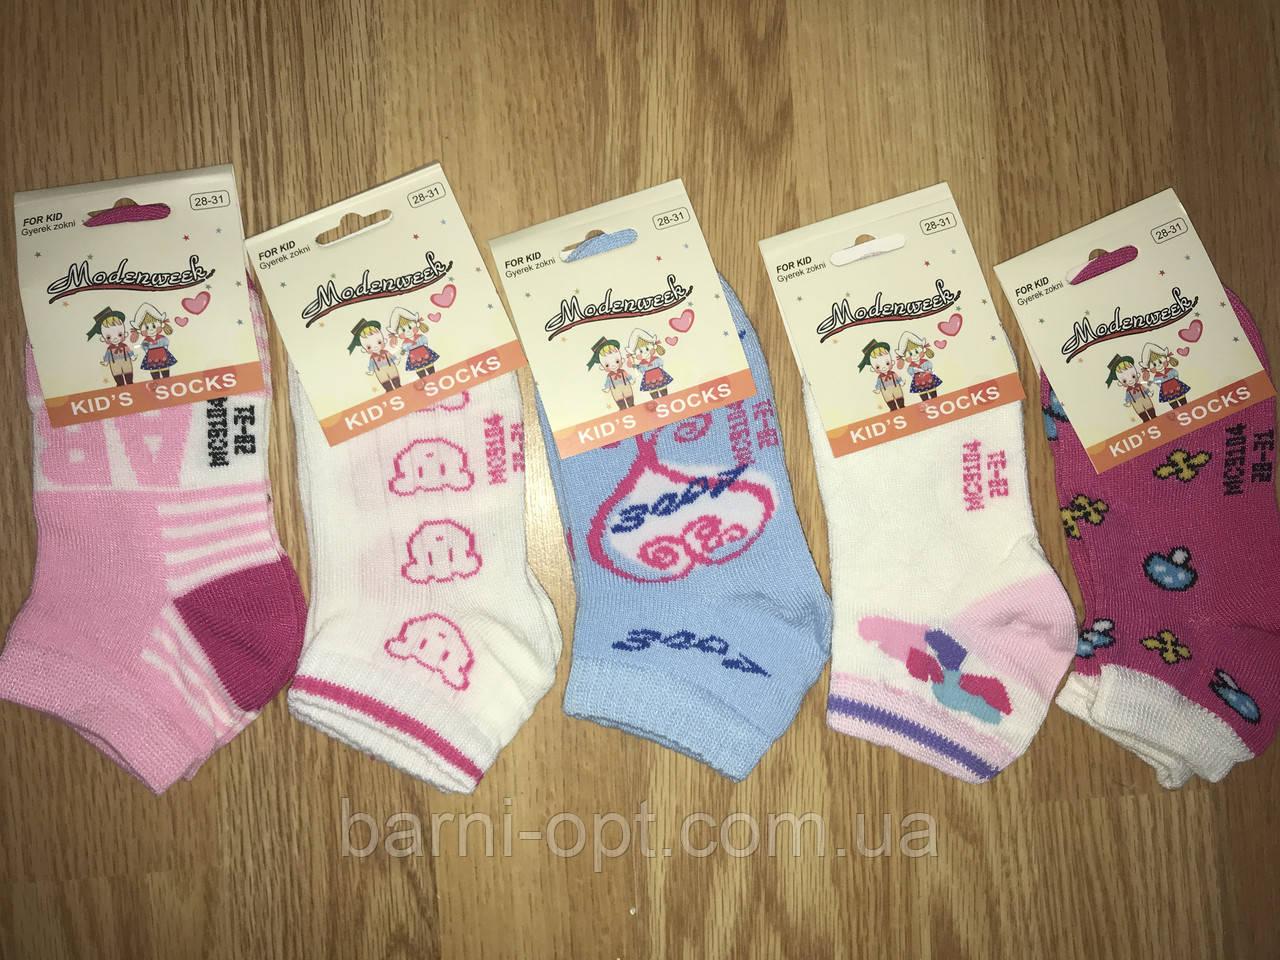 Носки для девочек Modenweek оптом 23-38р